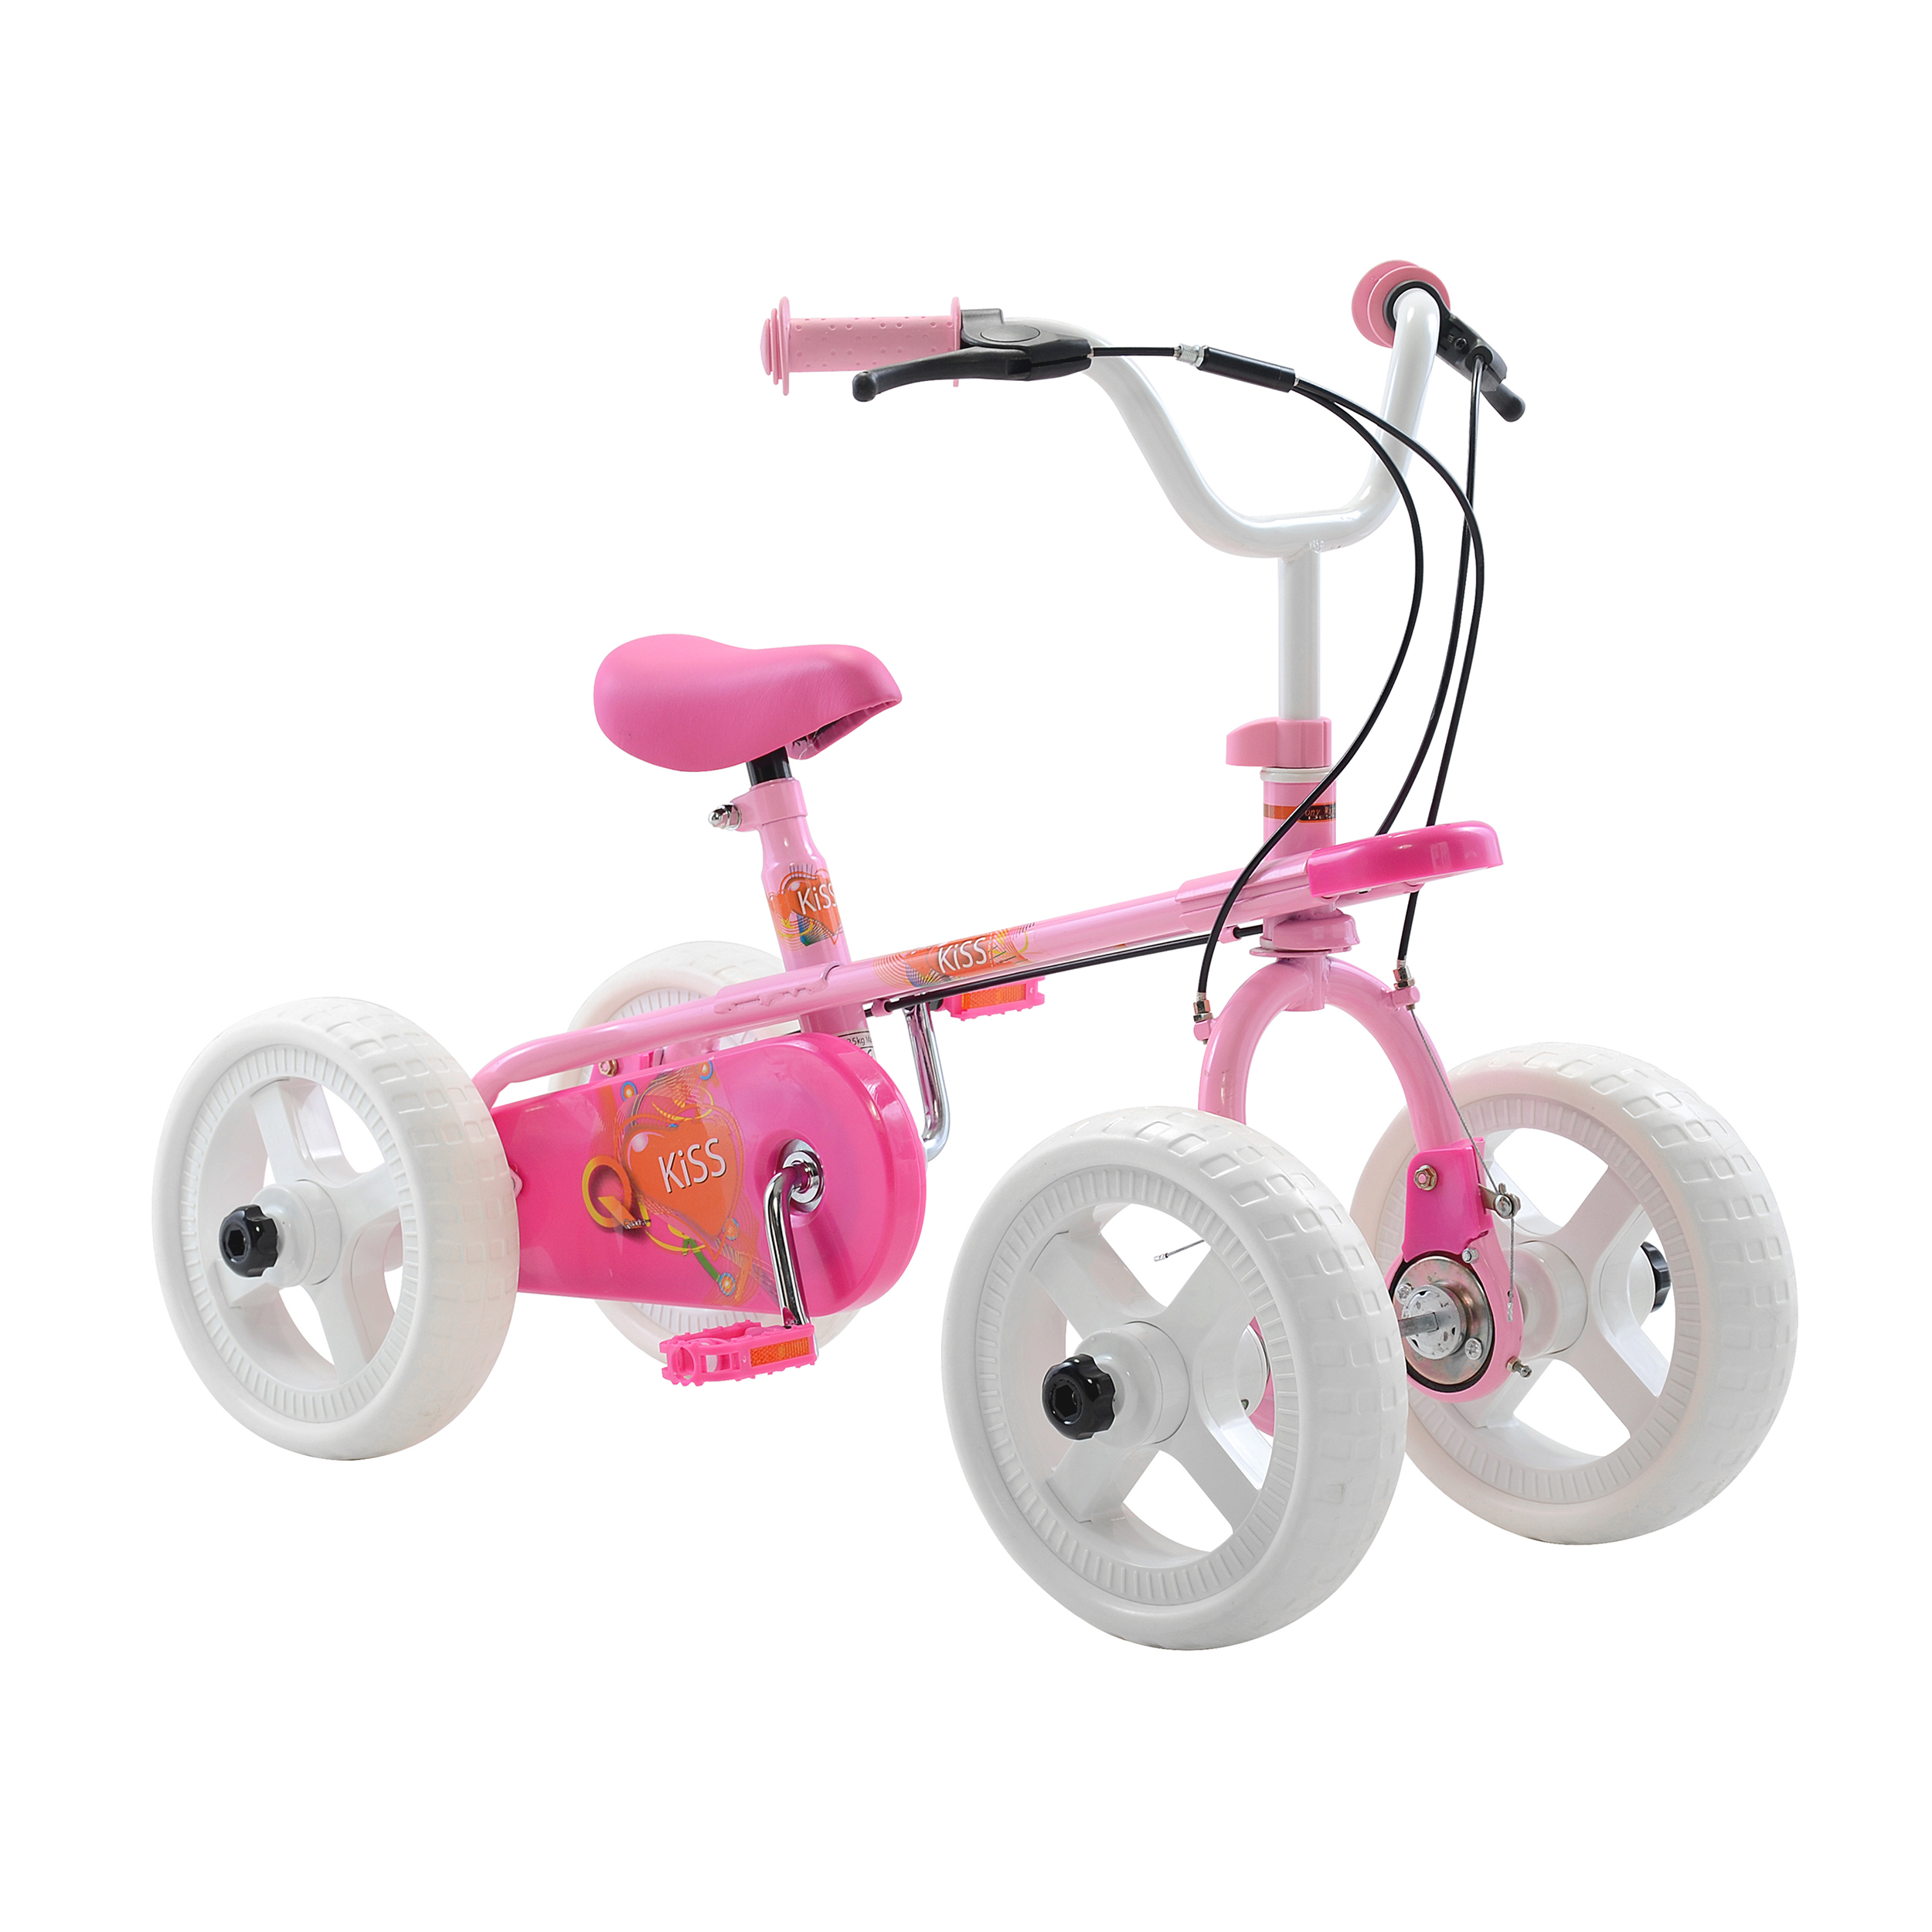 Quadrabyke Kiss 4-Wheel Bike PartNumber: 00683415000P KsnValue: 7494847 MfgPartNumber: KT095-01